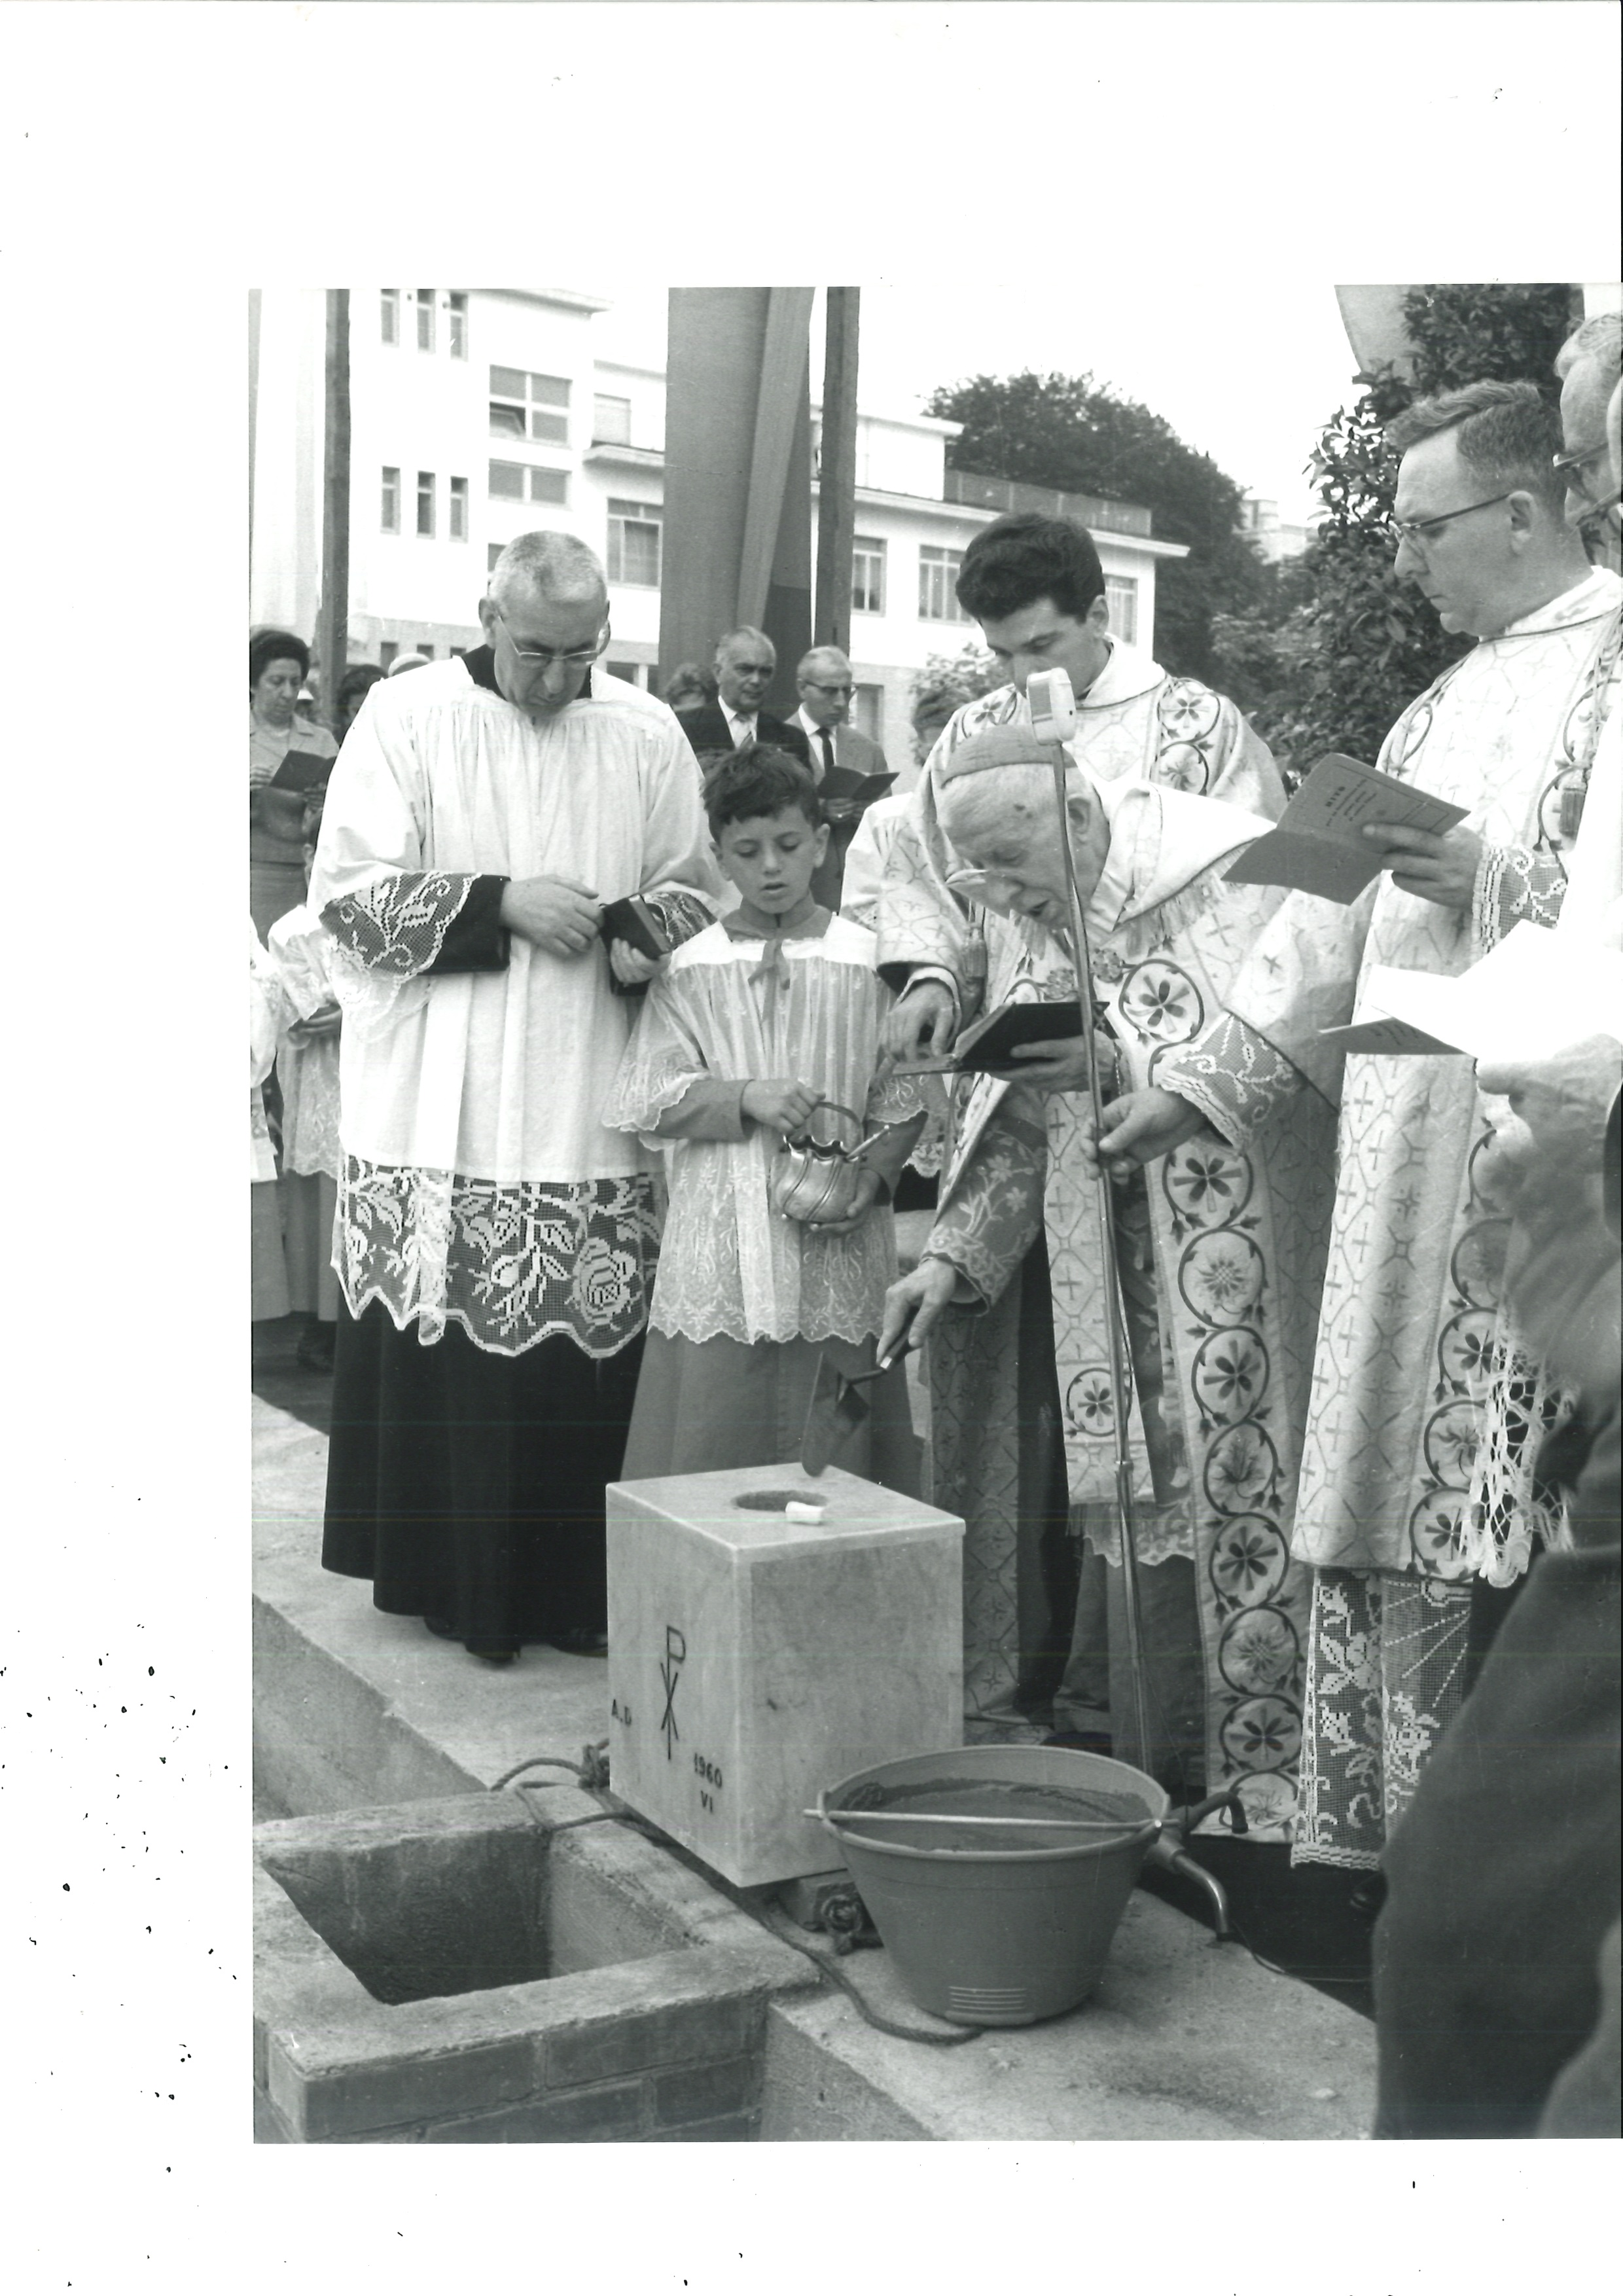 19 giugno 1960: Il cardinal Fossati benedice la prima pietra